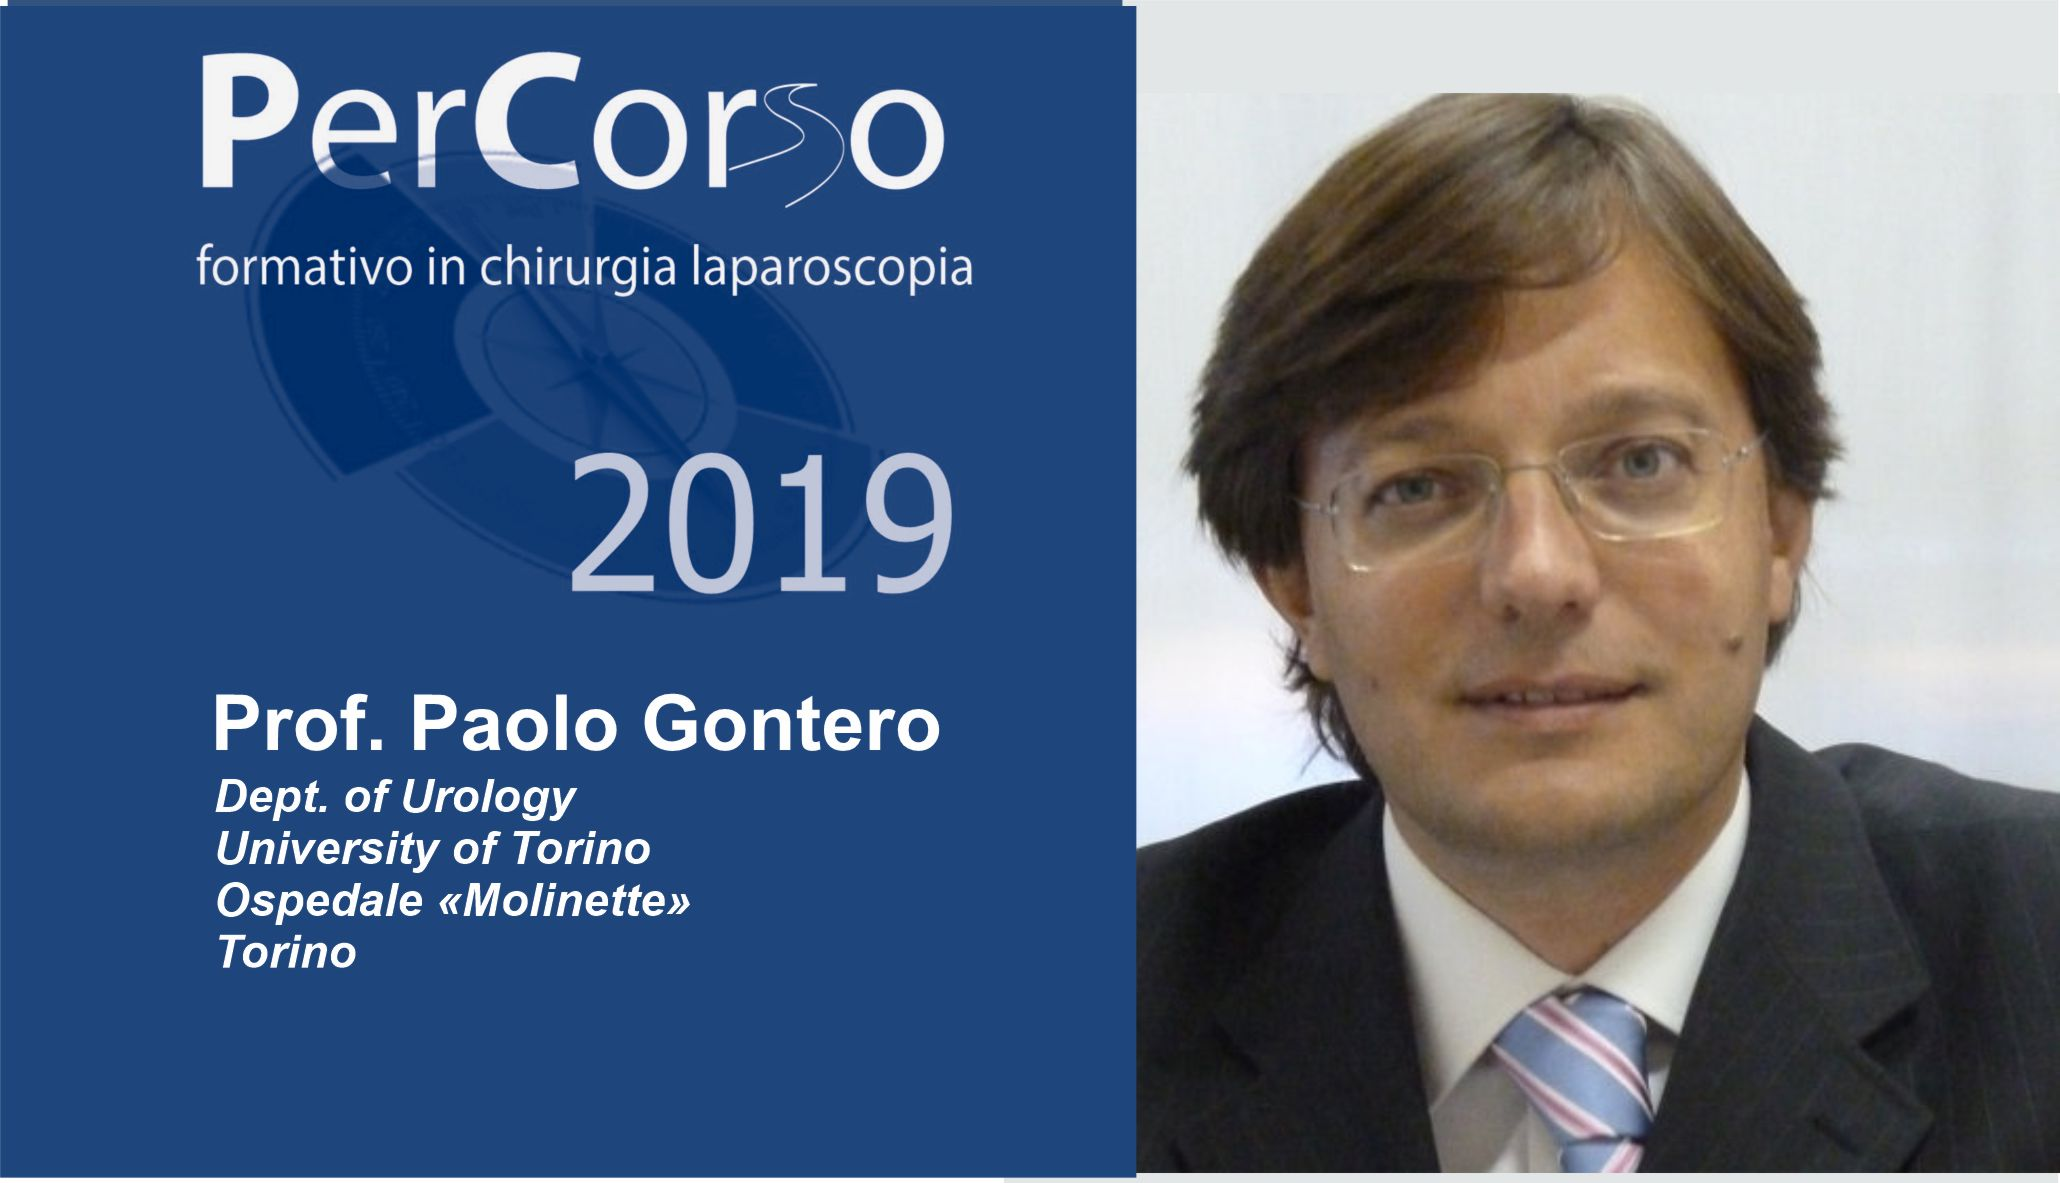 Paolo Gontero